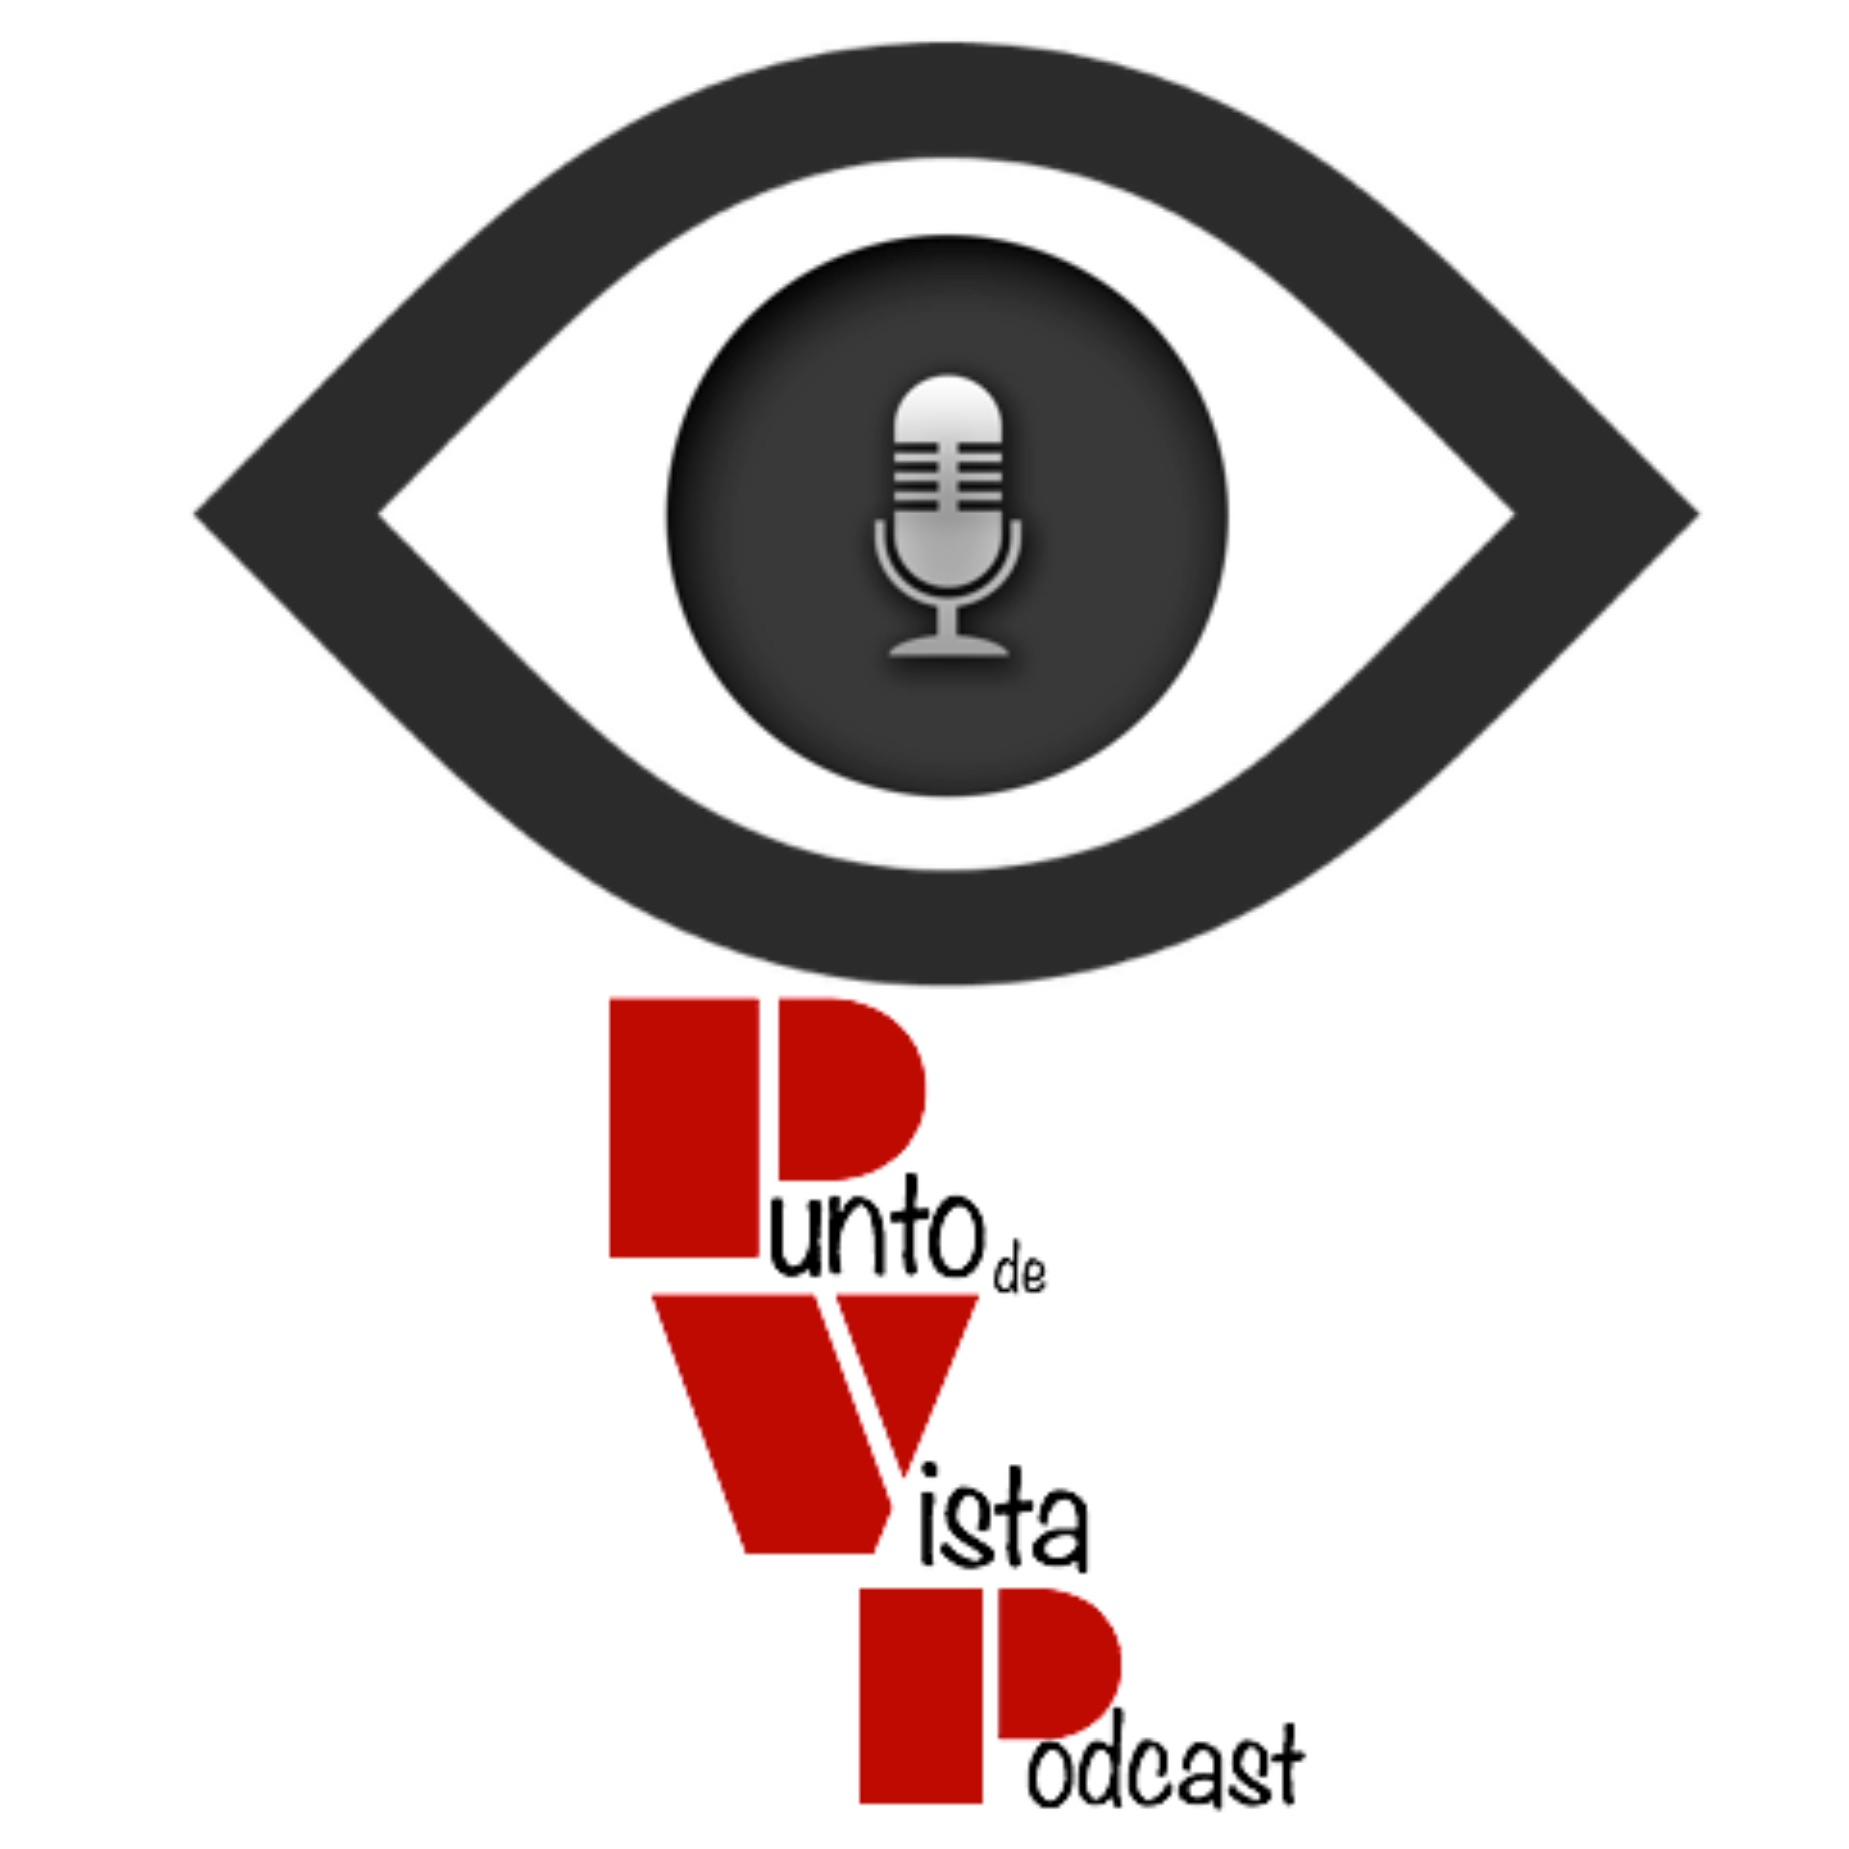 PDV Podcast